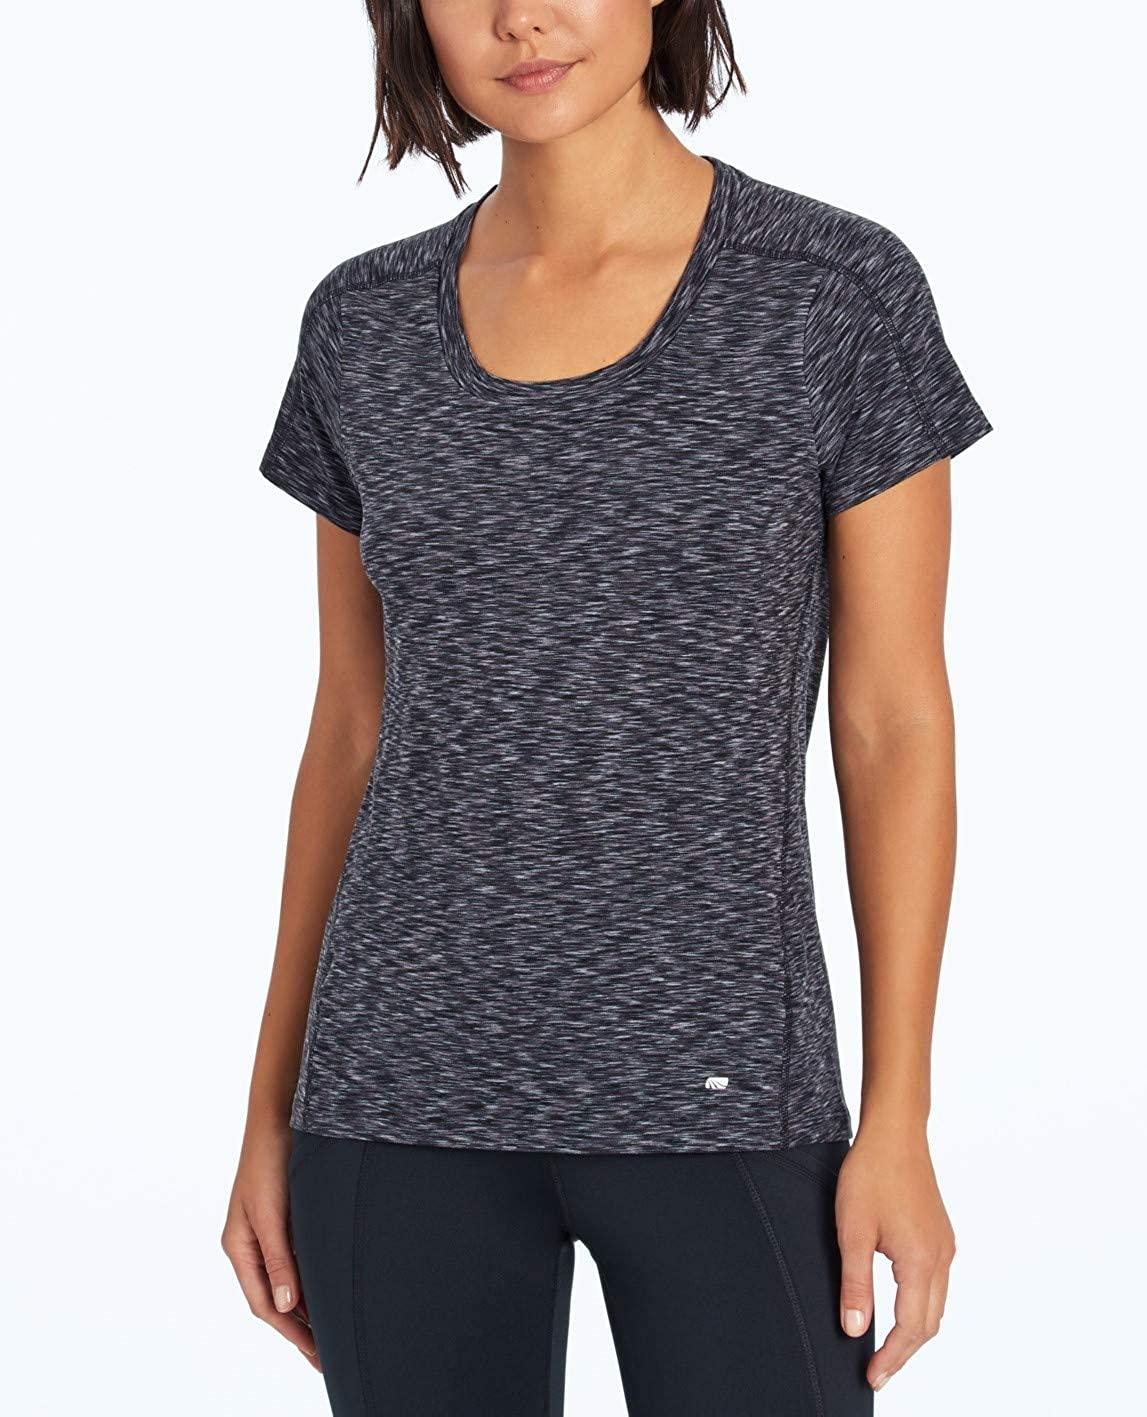 Marika Womens Short Sleeve Space Dye T-Shirt